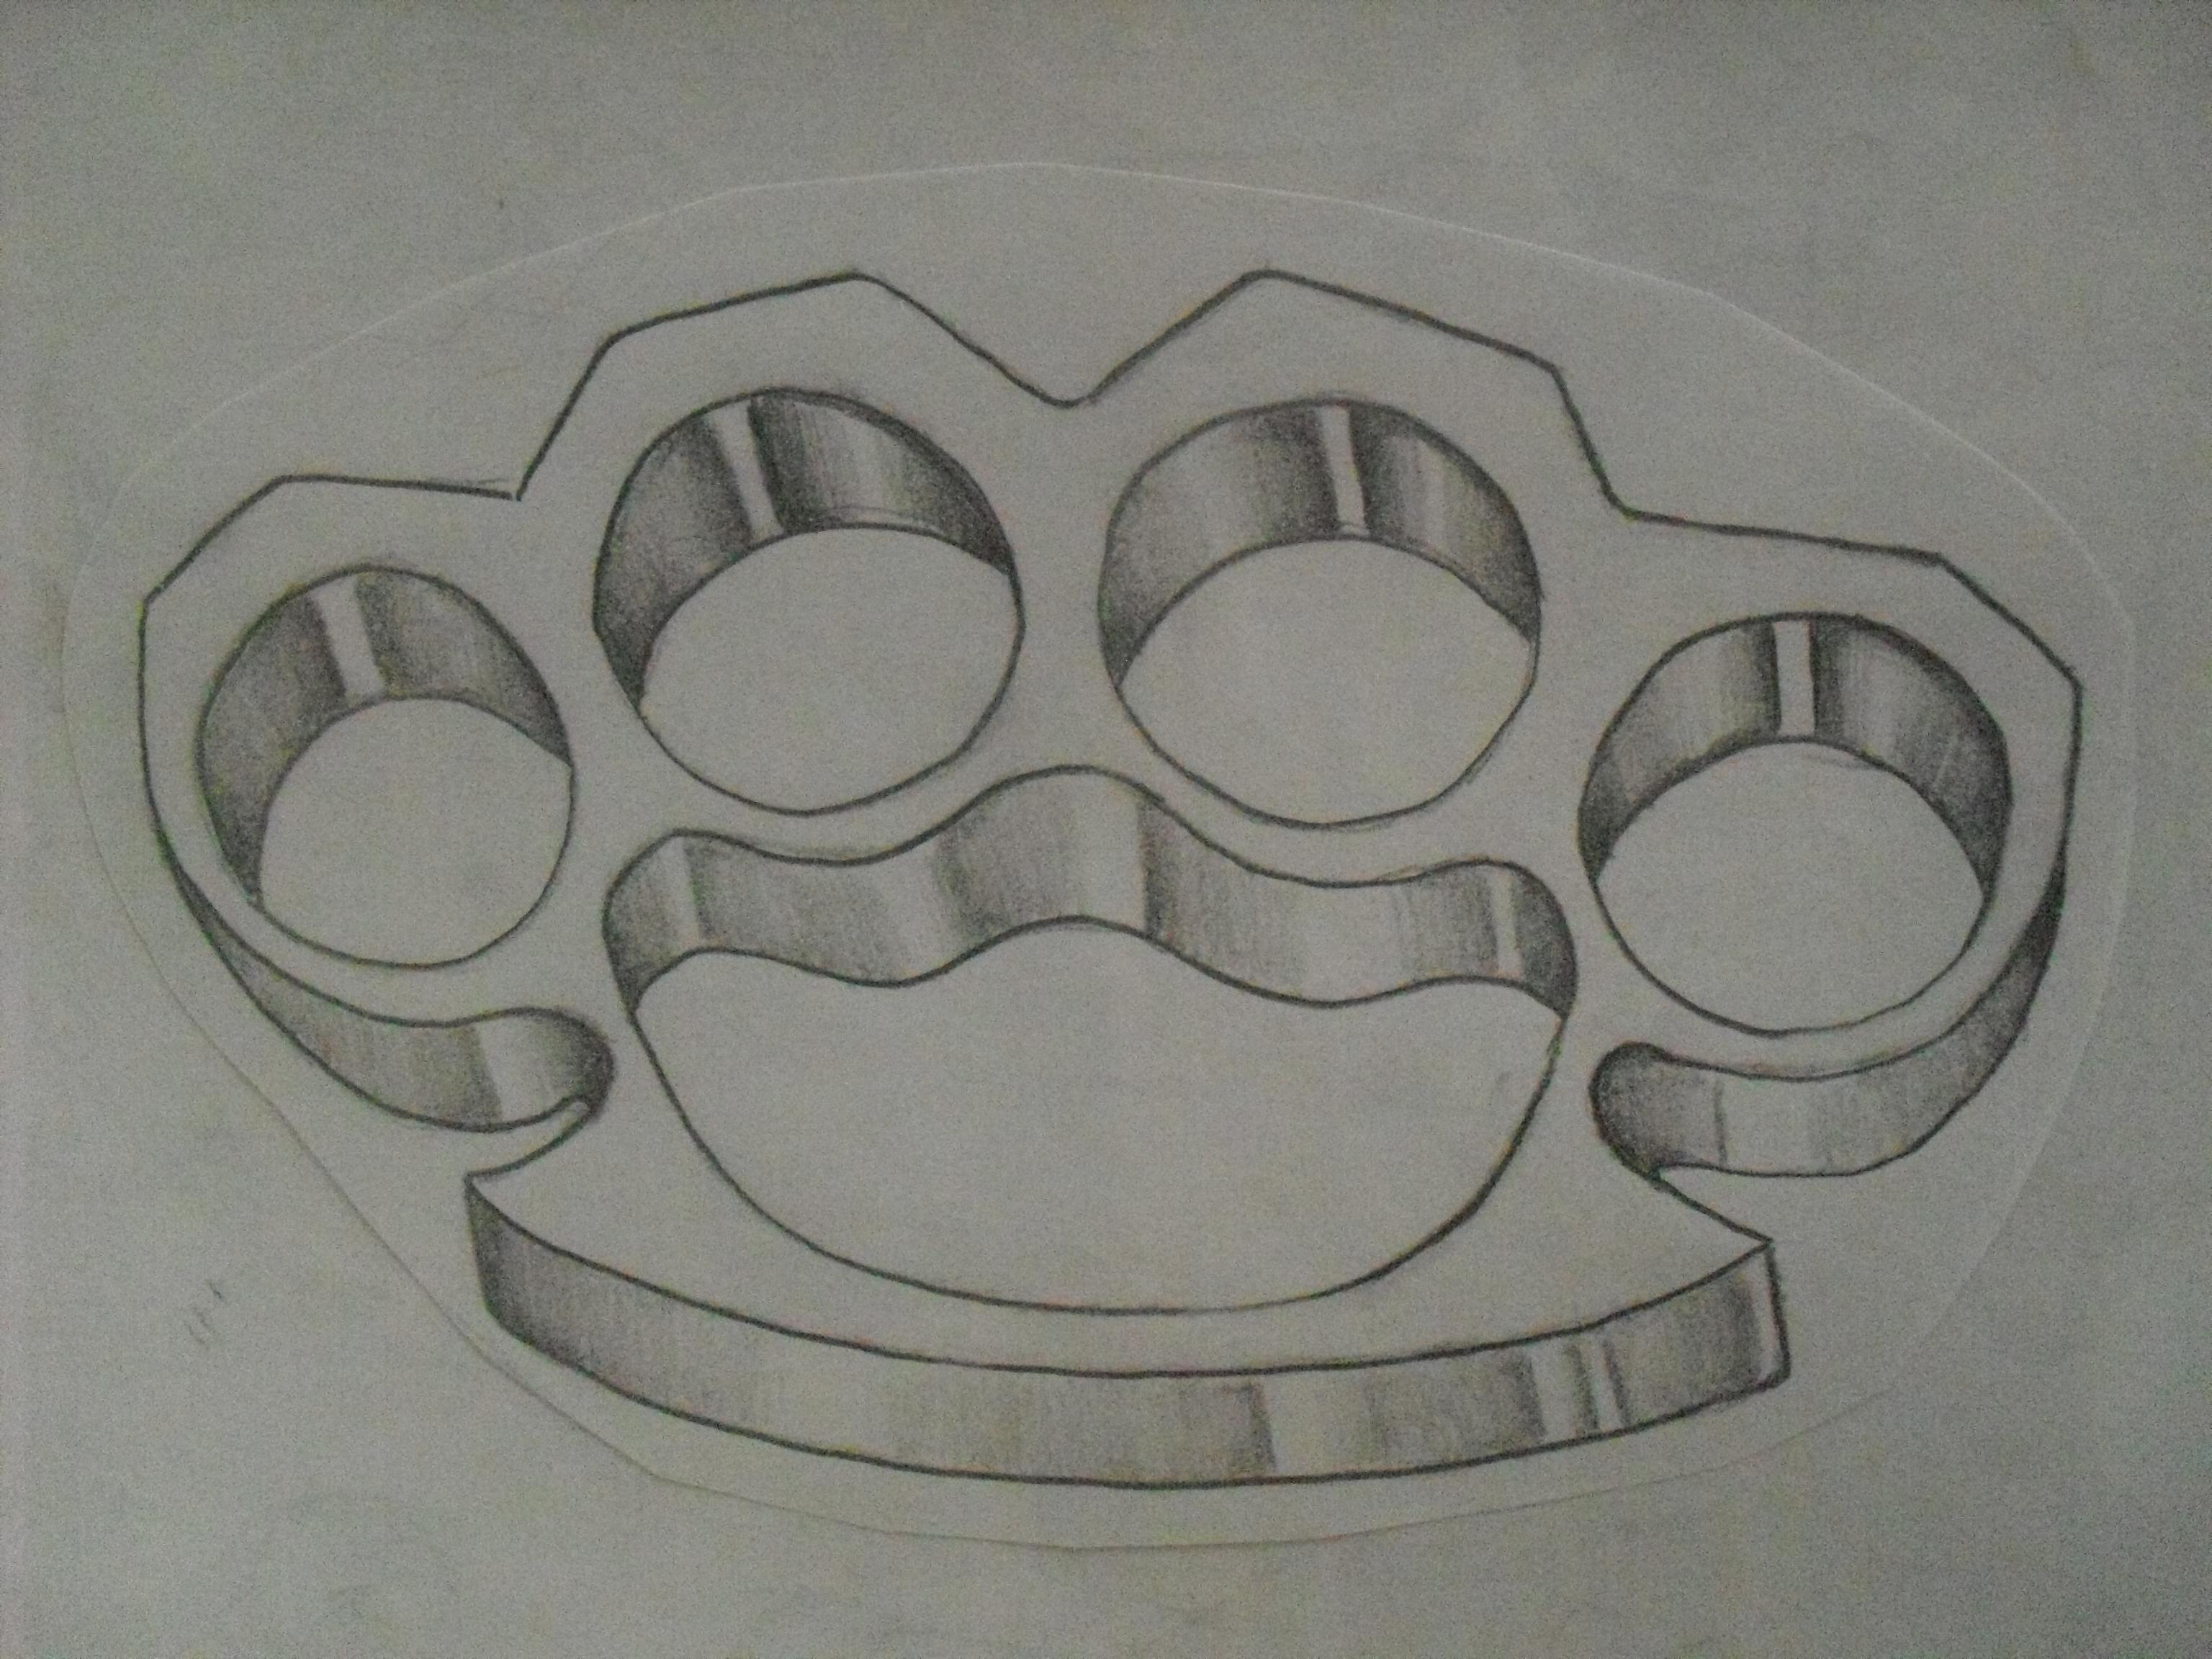 Brass Knuckle Tattoos